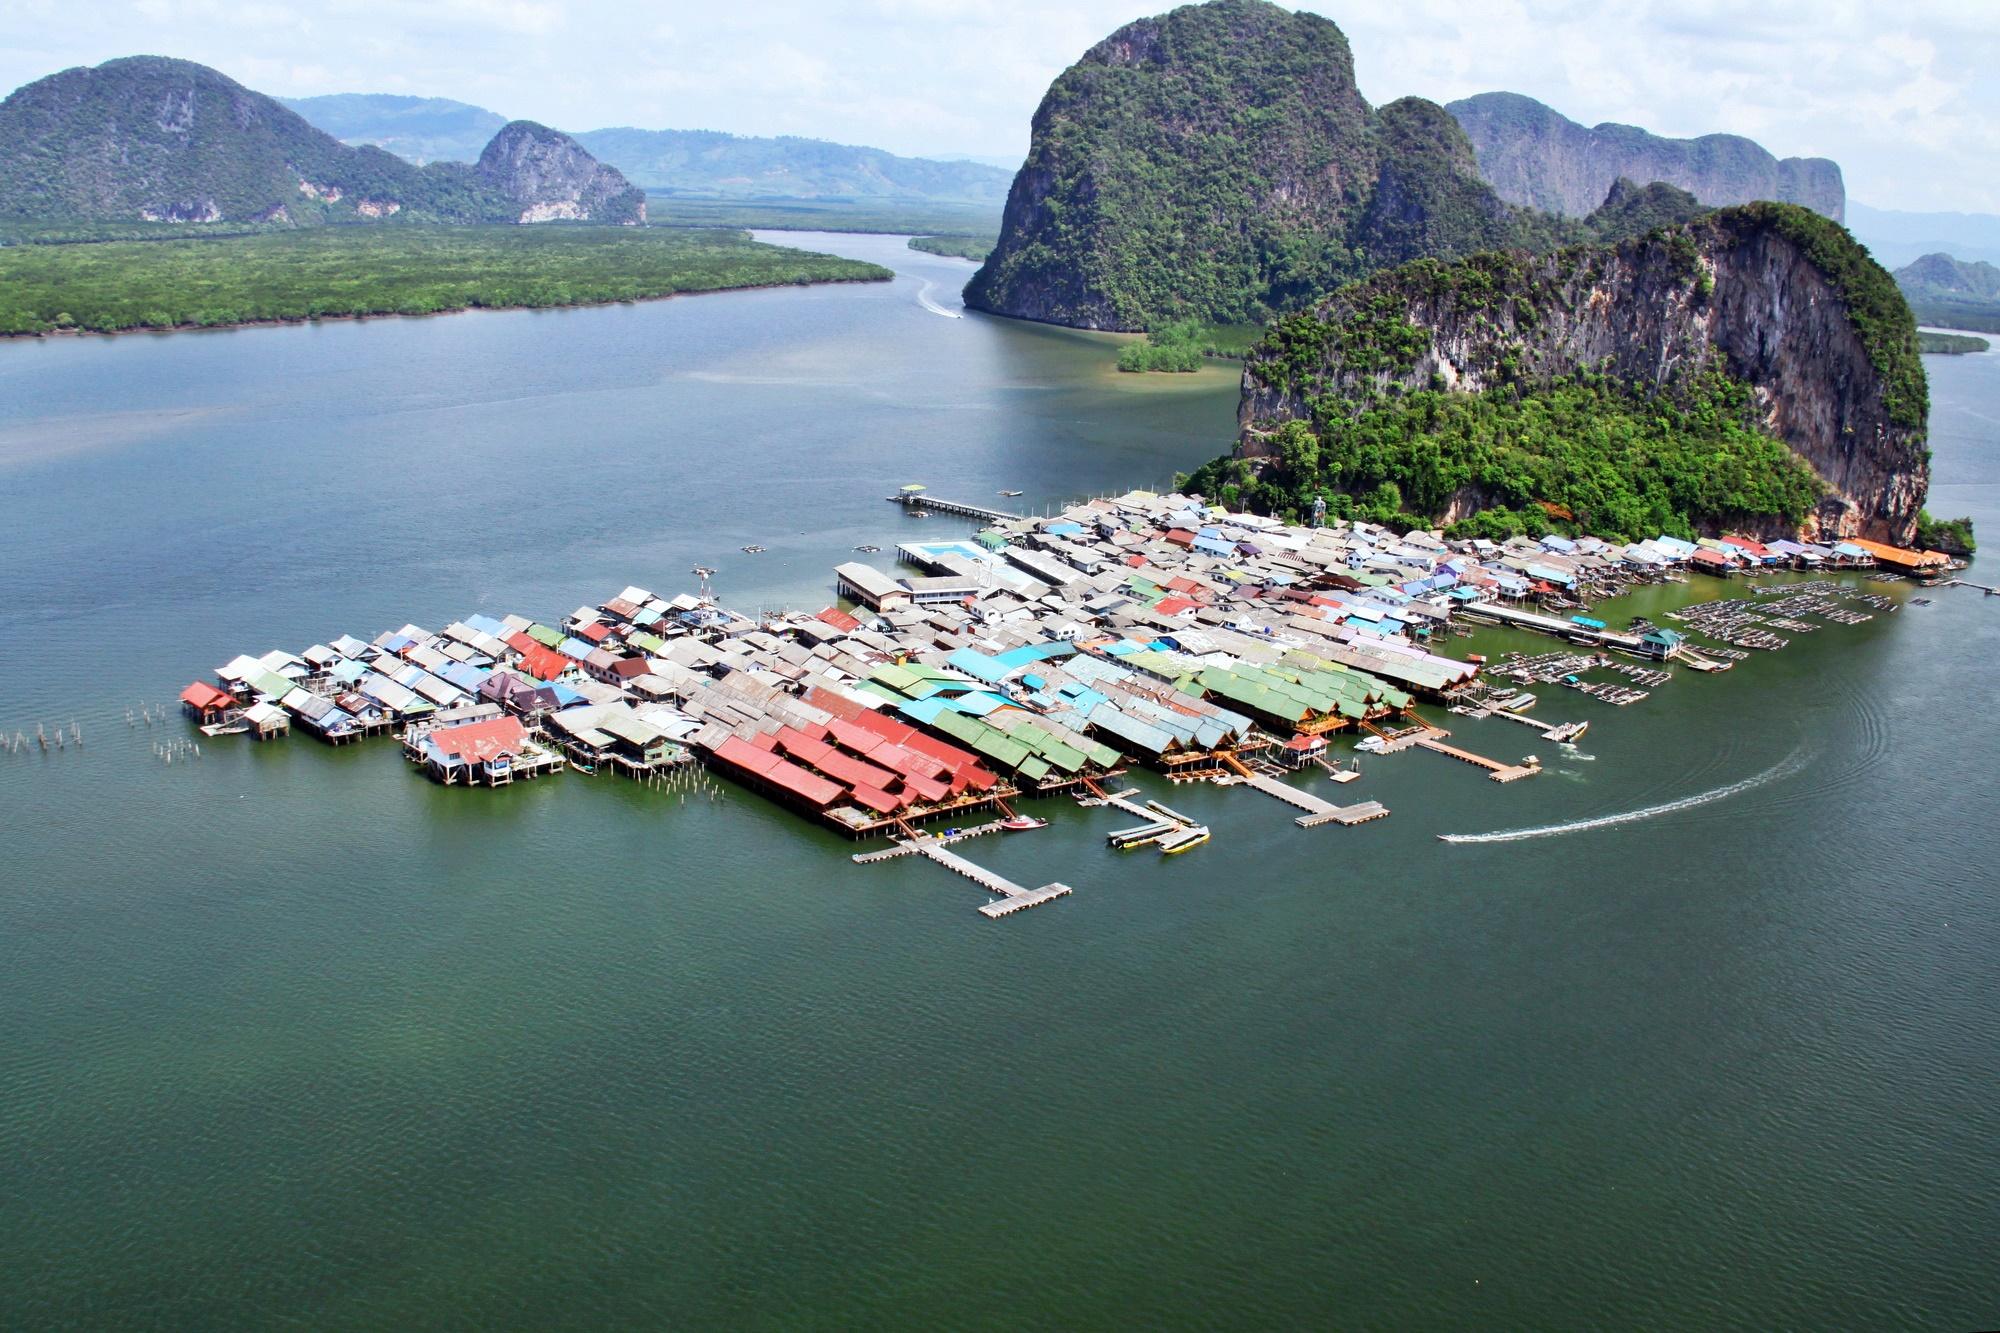 james bond island and sea cave canoe thailand phang nga water activity